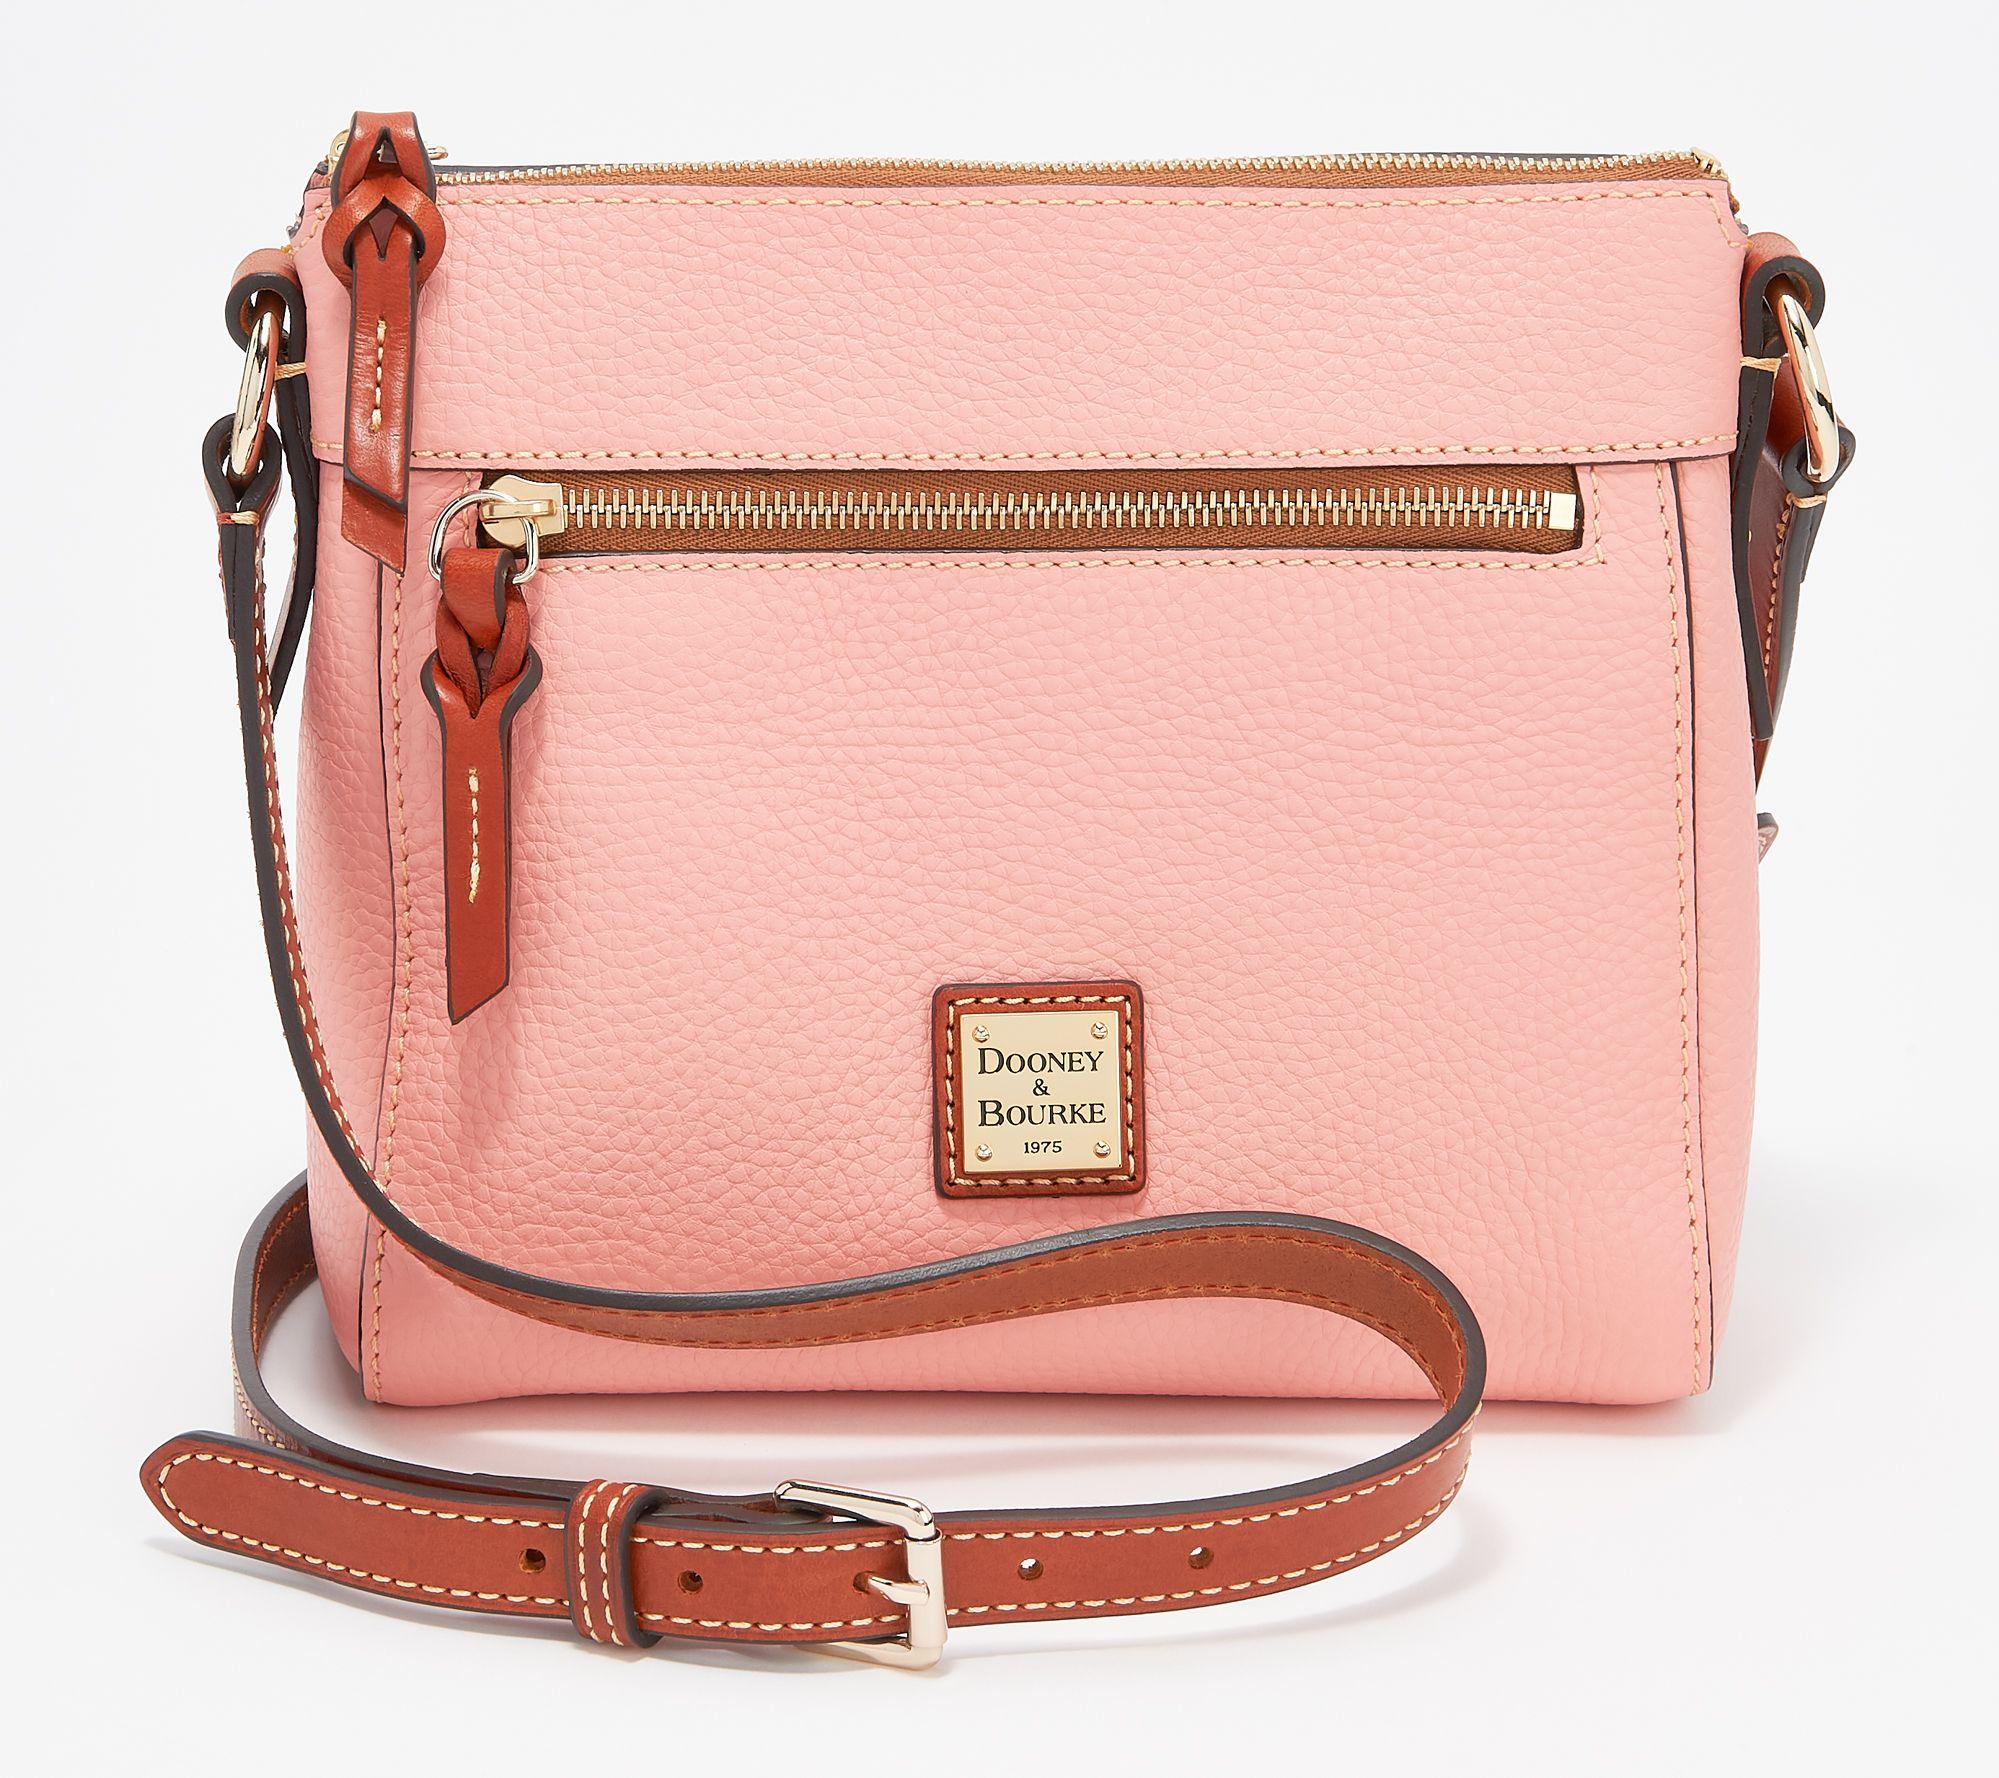 27259e82a9 Dooney   Bourke Pebble Leather Allison Crossbody Handbag - Page 1 — QVC.com